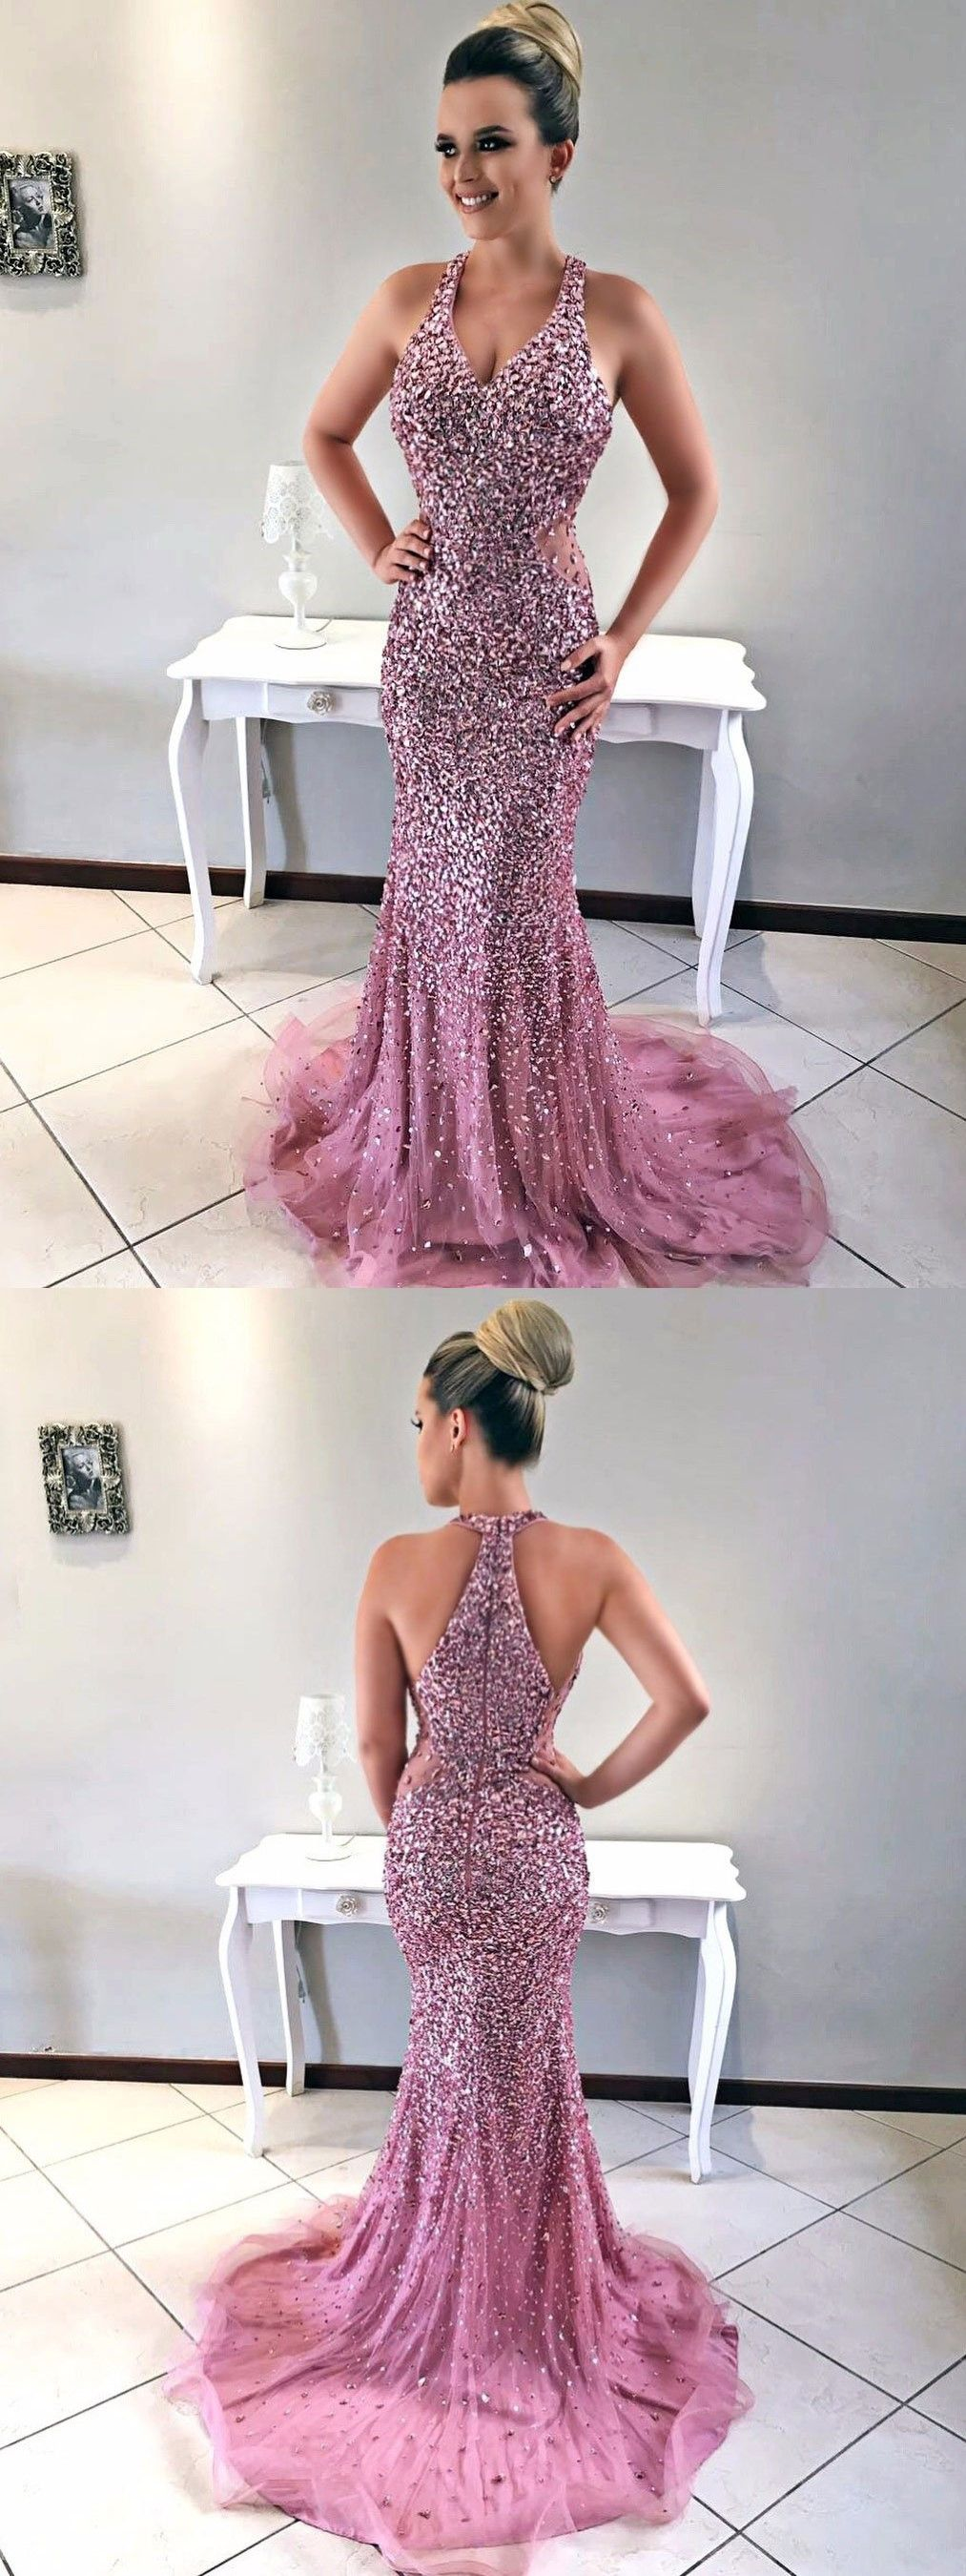 Mermaid vneck sweep train light purple tulle prom dress with